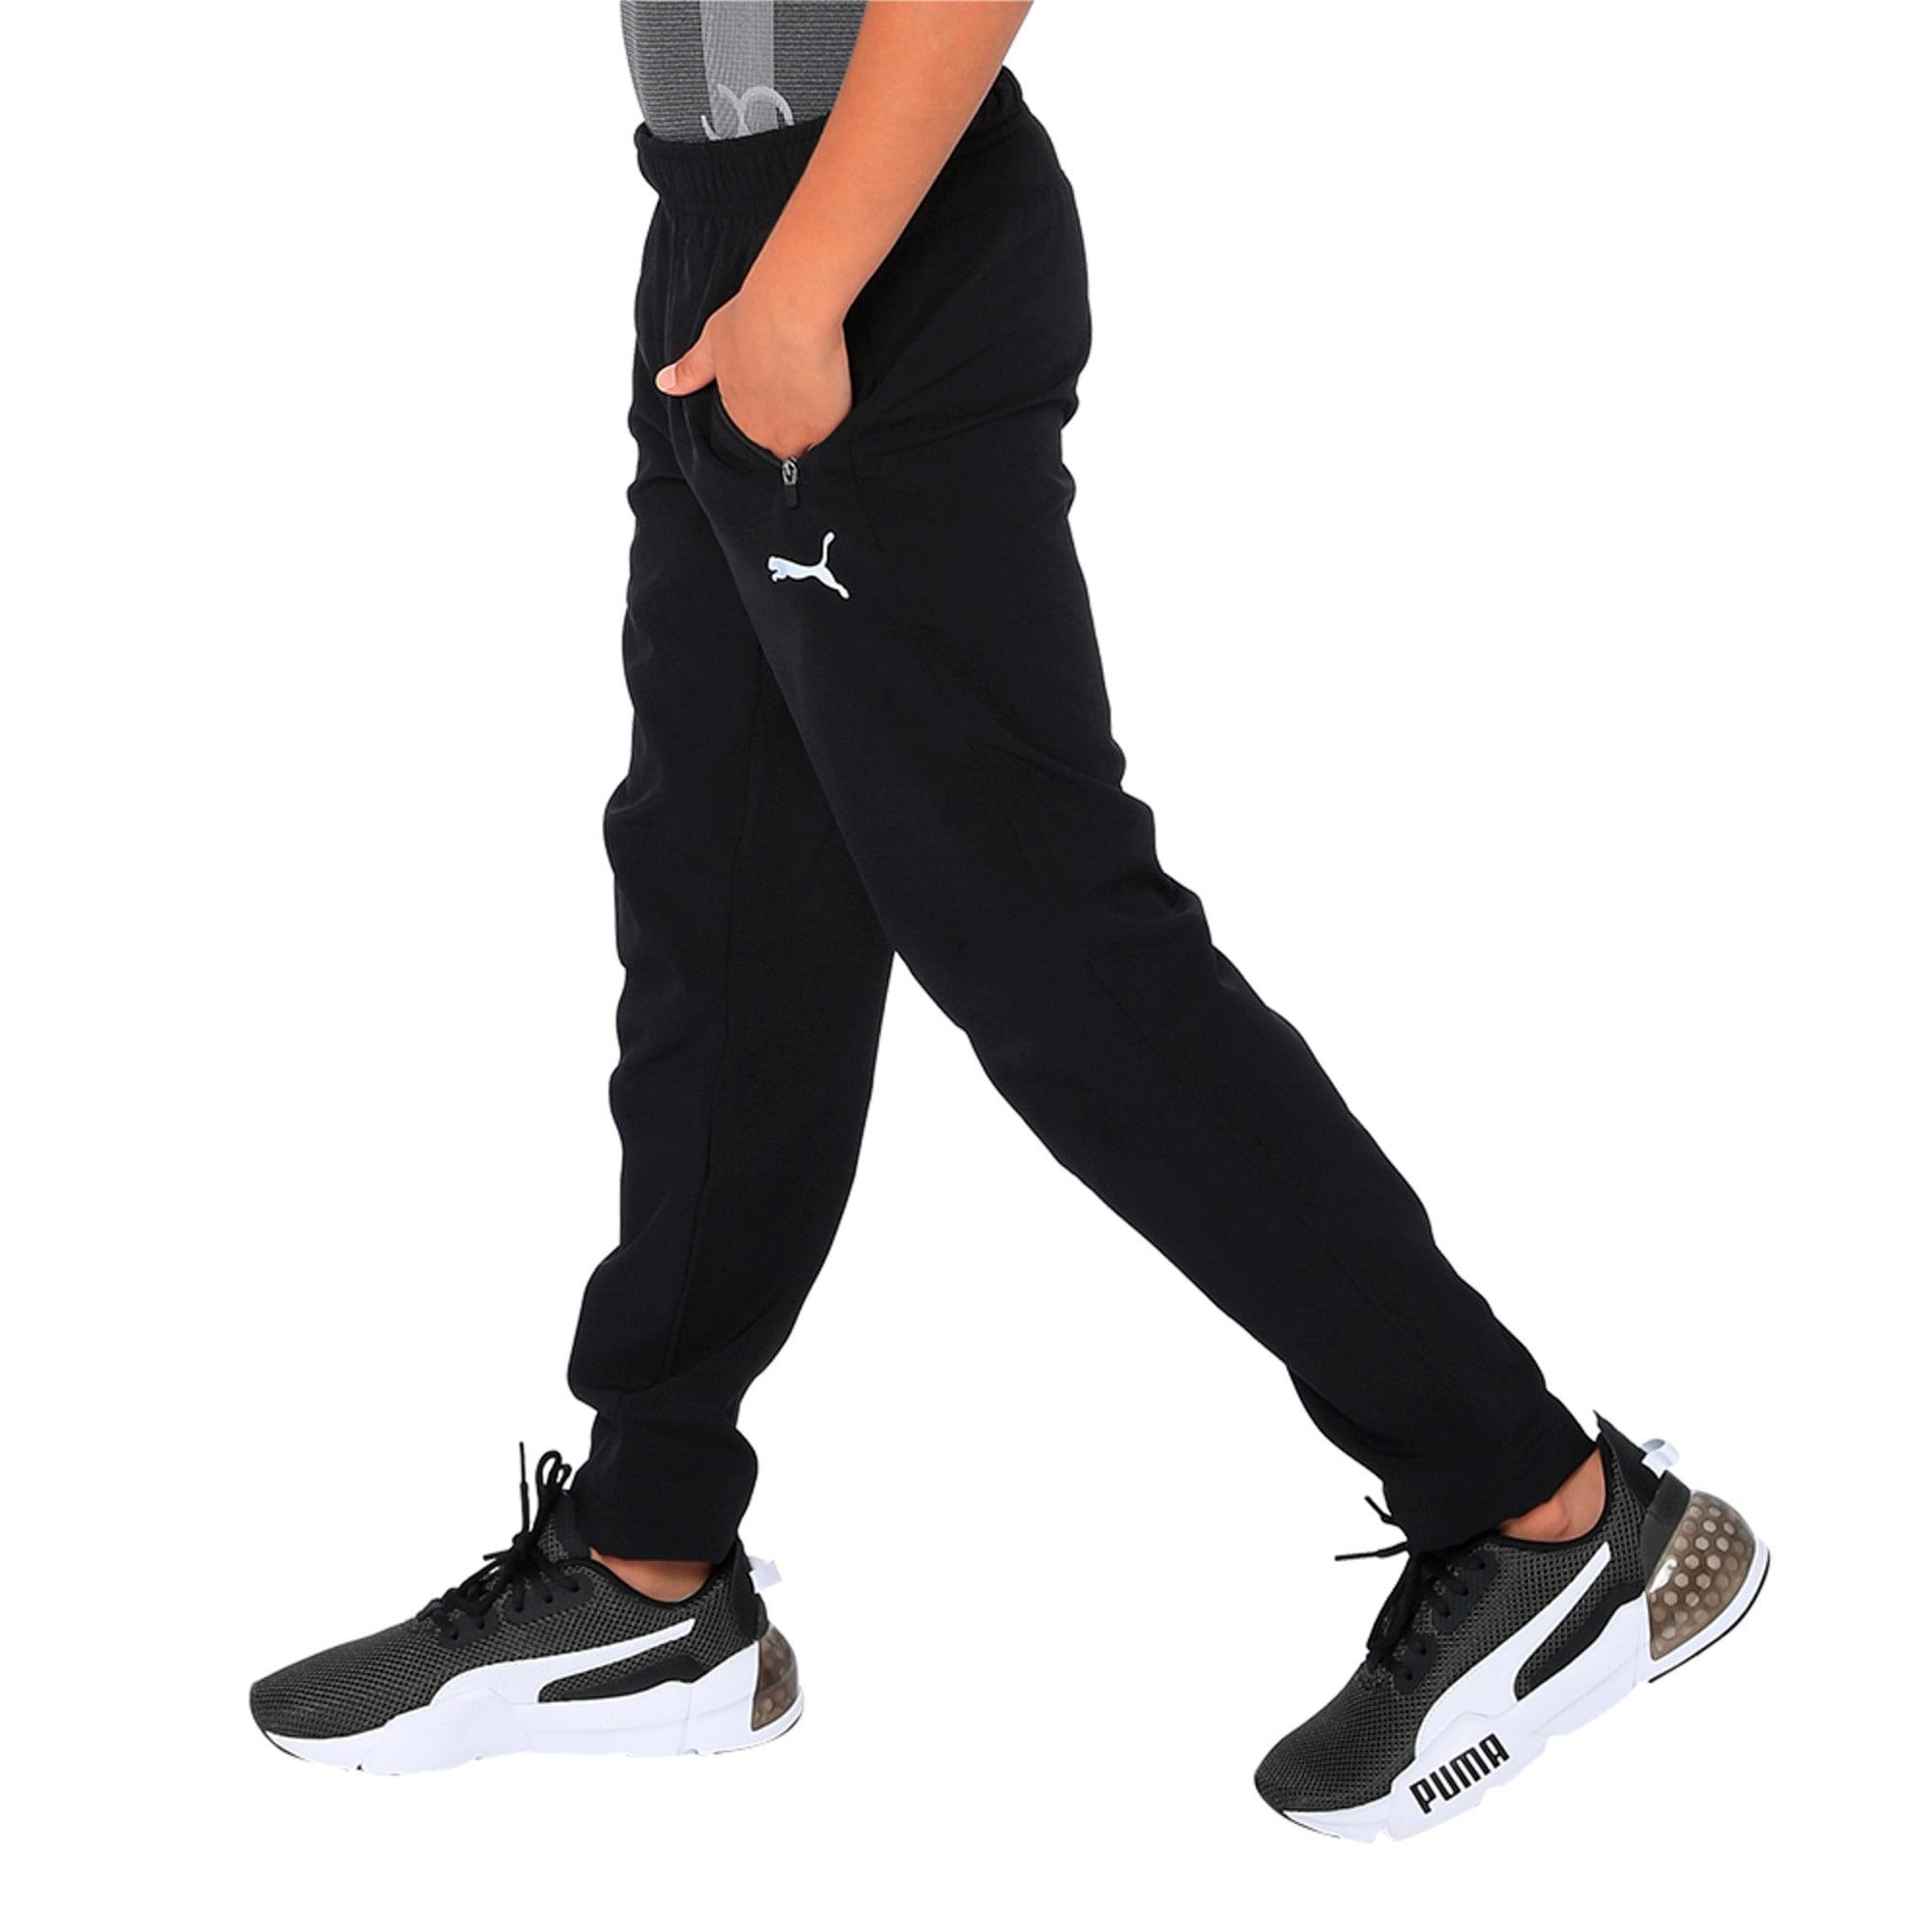 Thumbnail 1 of one8 VK Kids' Active Pants, Puma Black, medium-IND